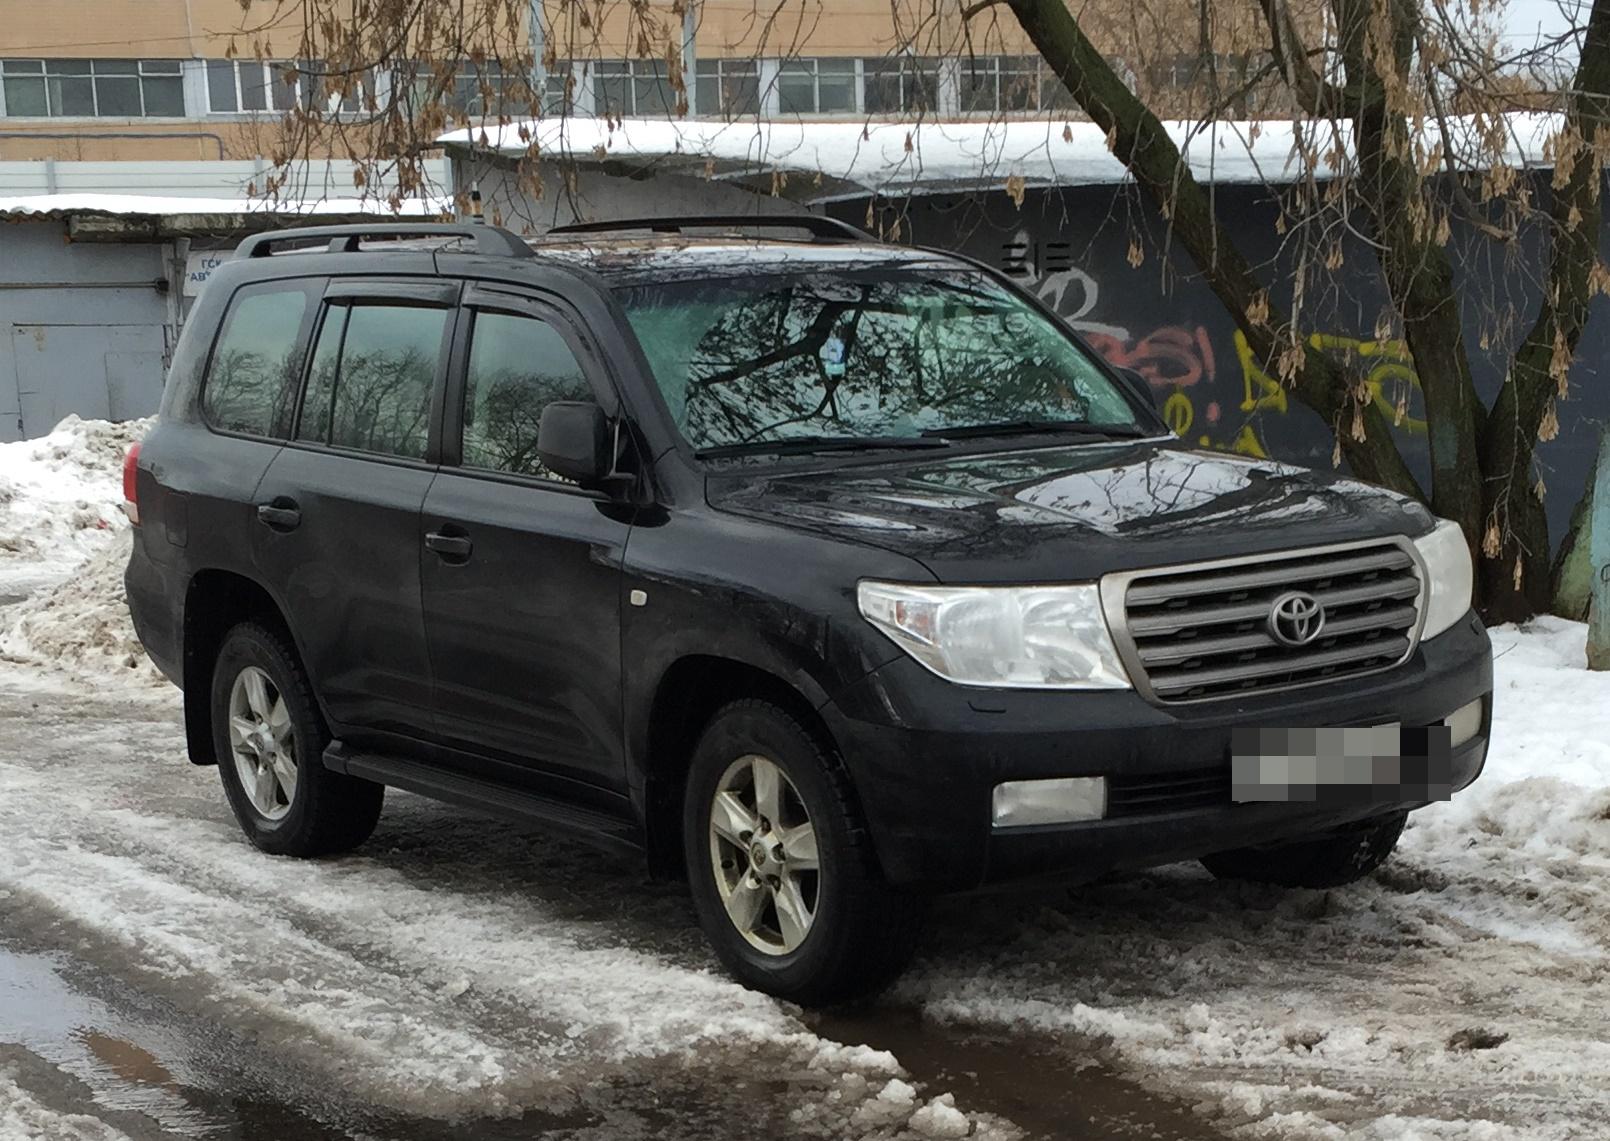 Toyota Land Cruiser 200 Дашдамирова. Фото ©Avto-nomer.ru